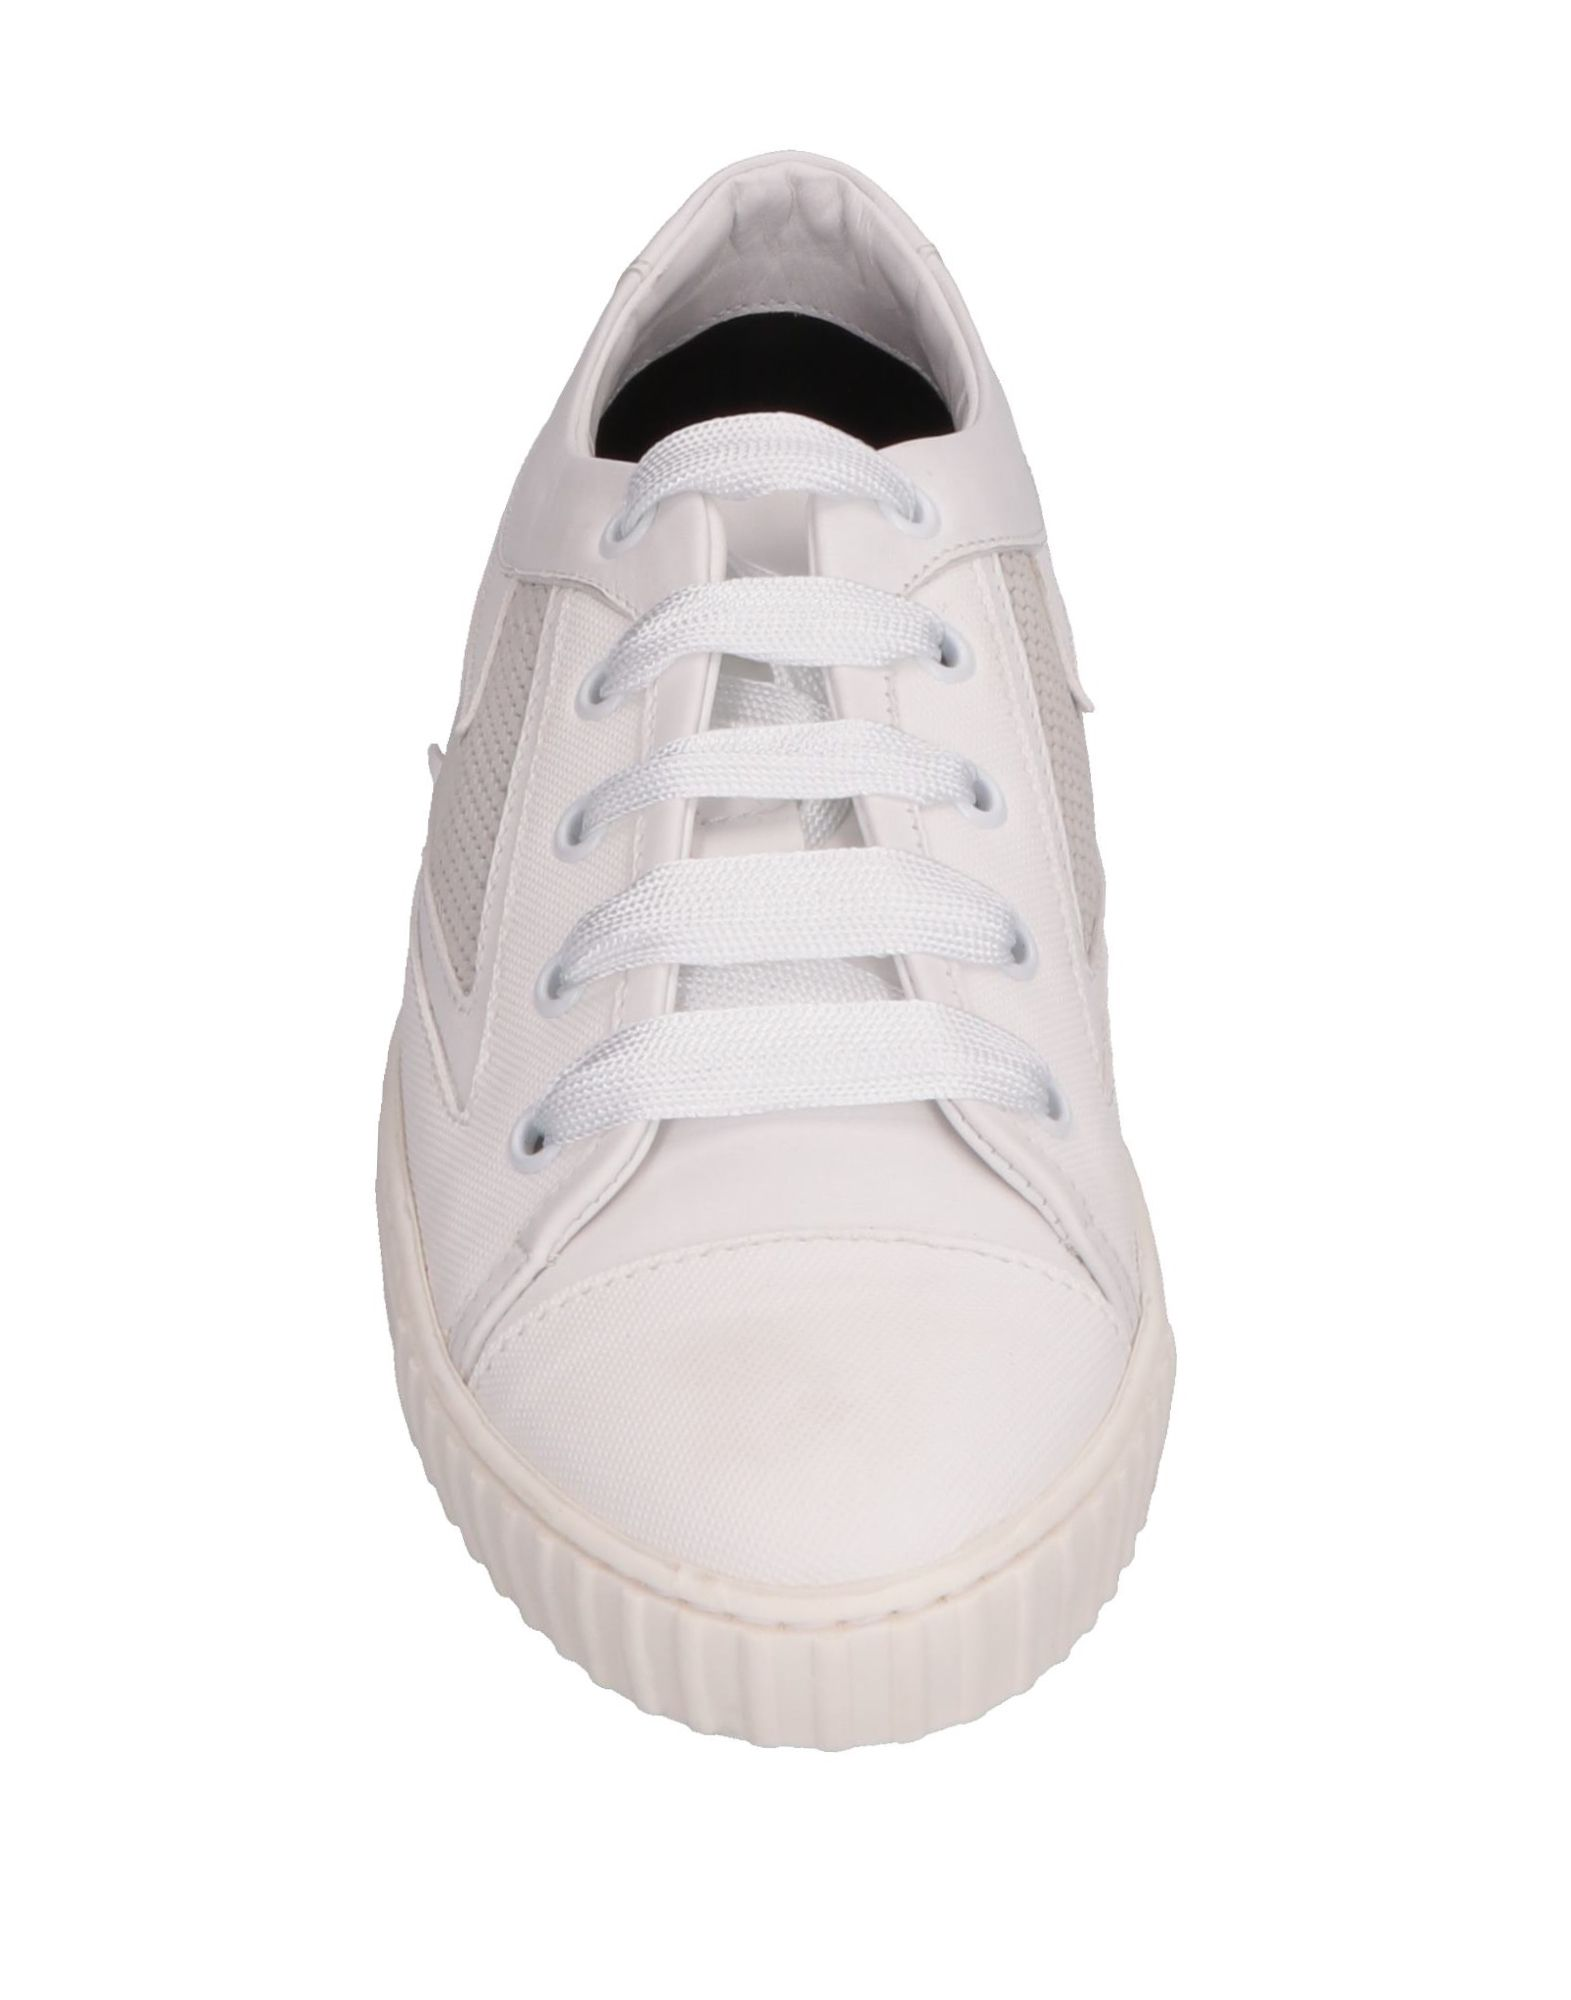 Rabatt Schuhe Alberto Fermani  Sneakers Damen  Fermani 11563651PE a5088d